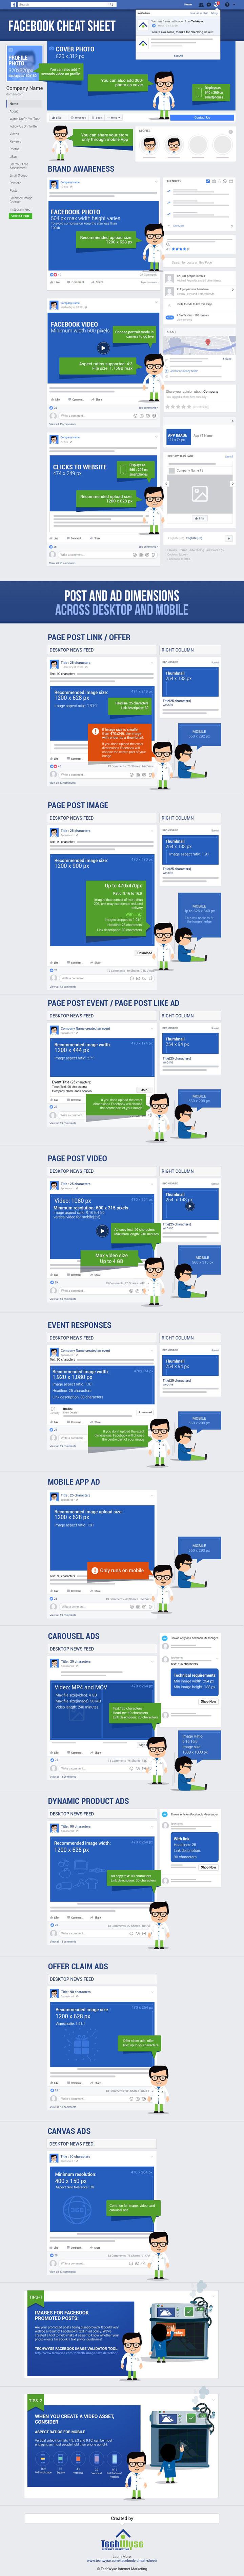 Panduan Ukuran Gambar Facebook 2018